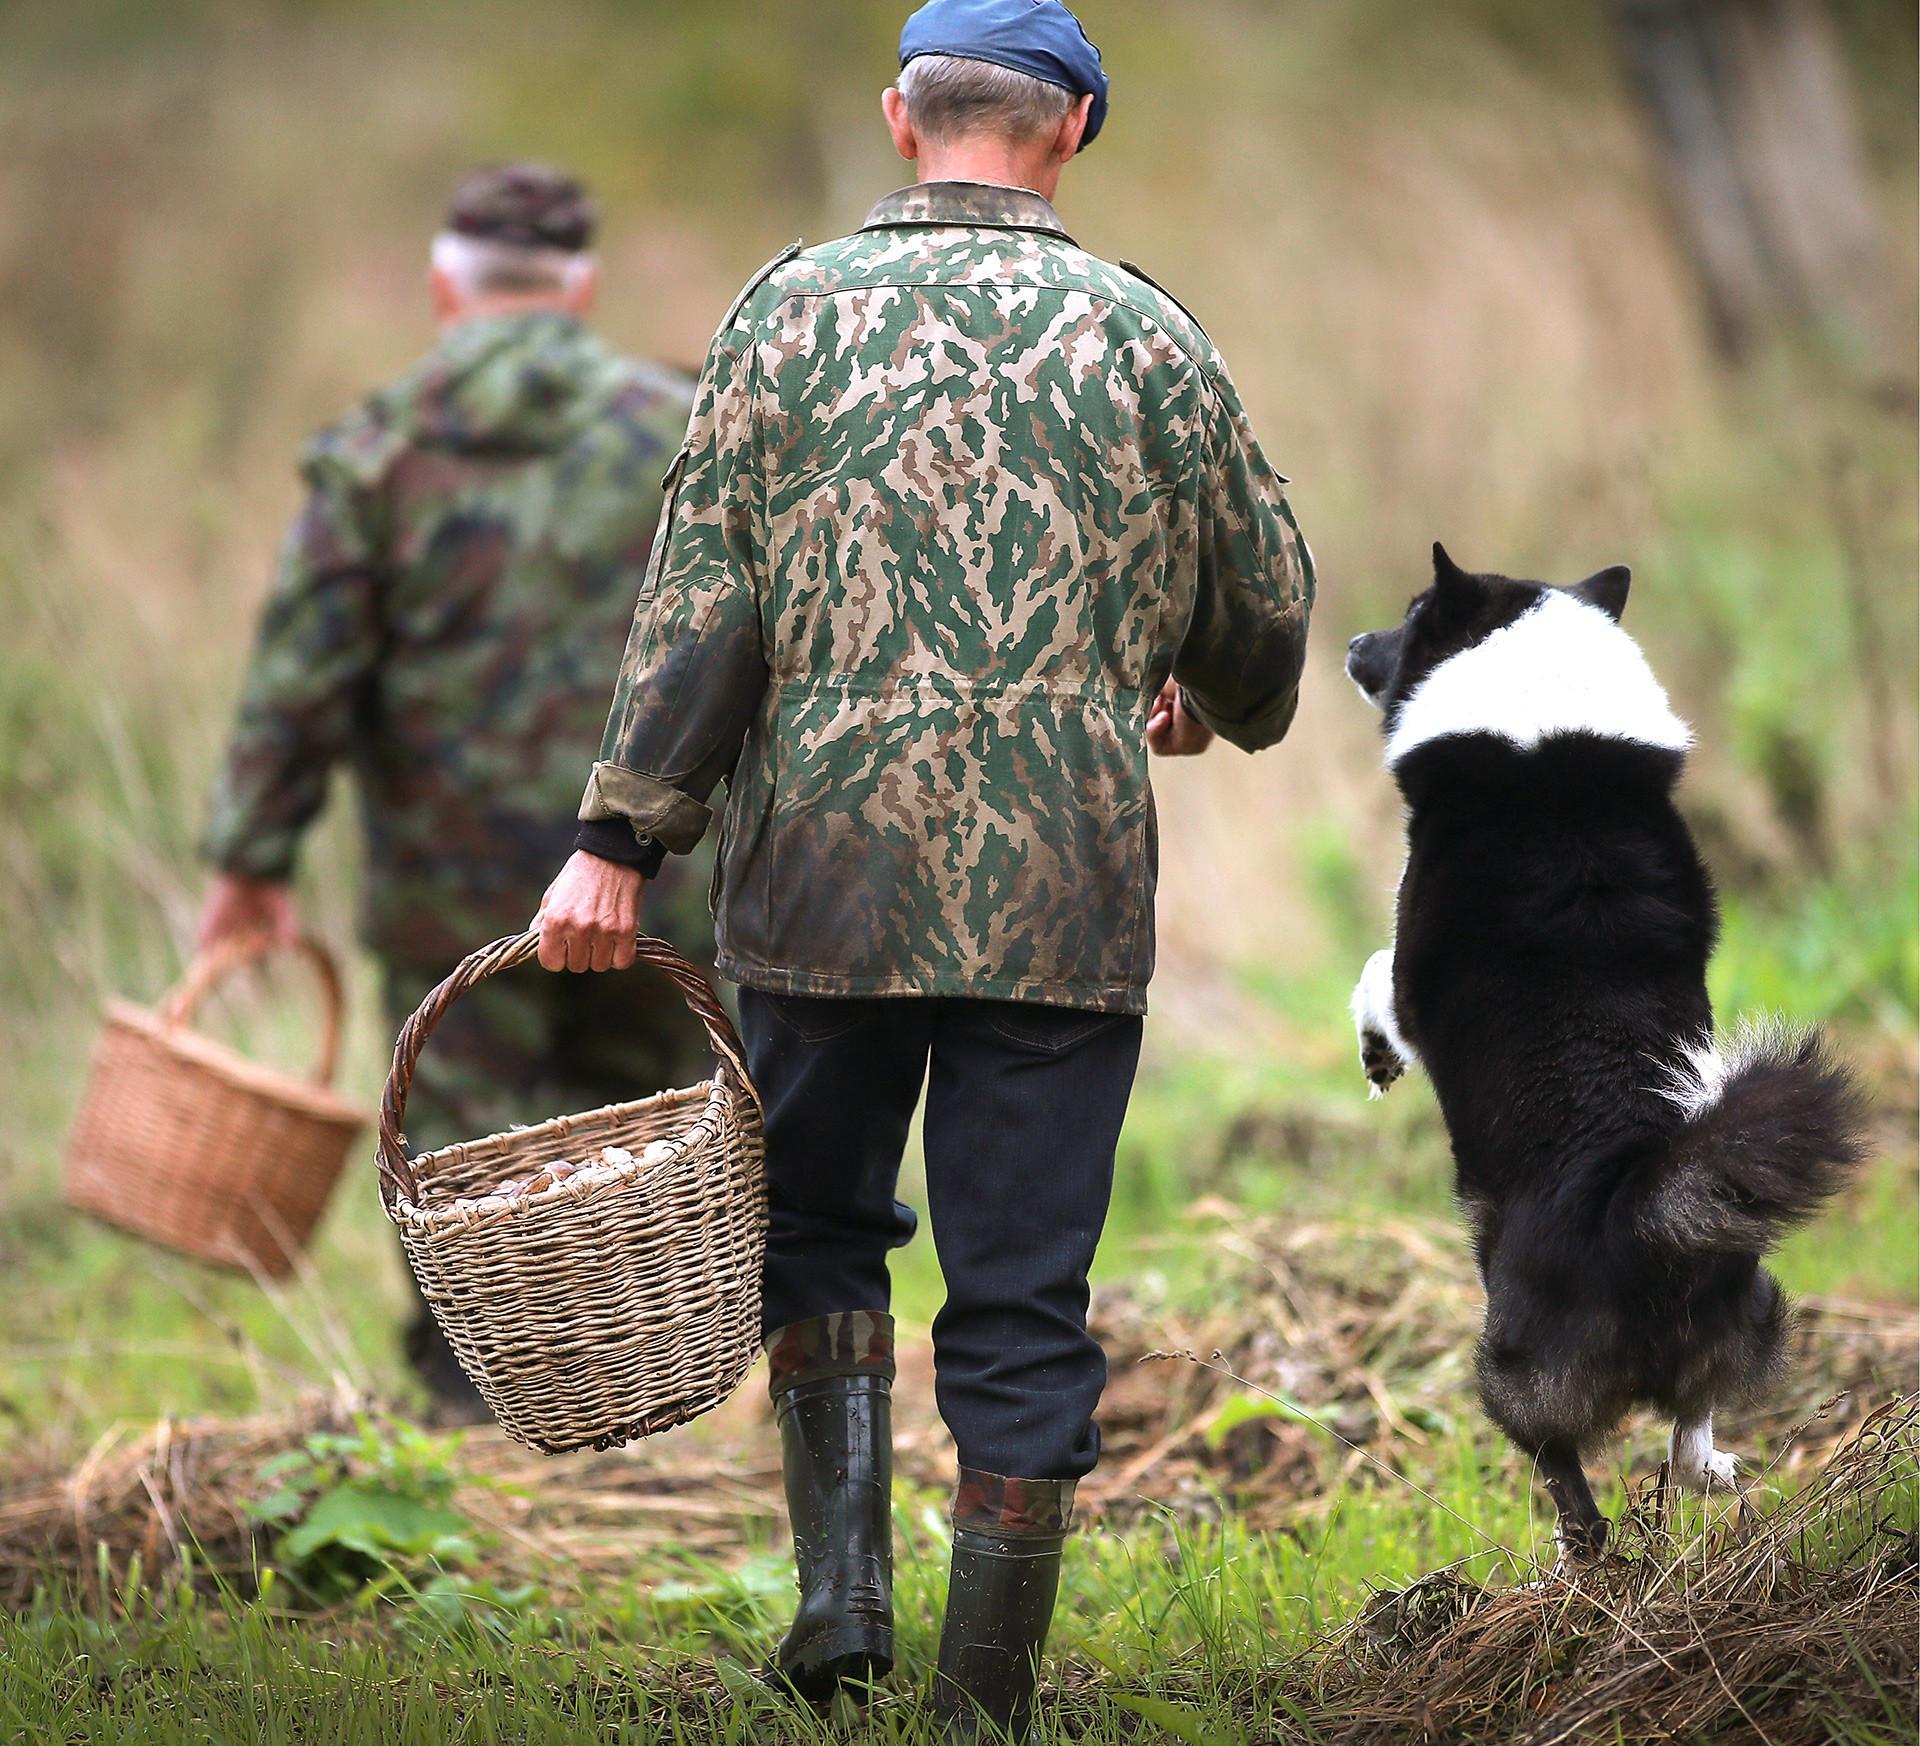 Pergi ke hutan dan menghabiskan berjam-jam mencari jamur - hampir setiap orang Rusia menyukainya.